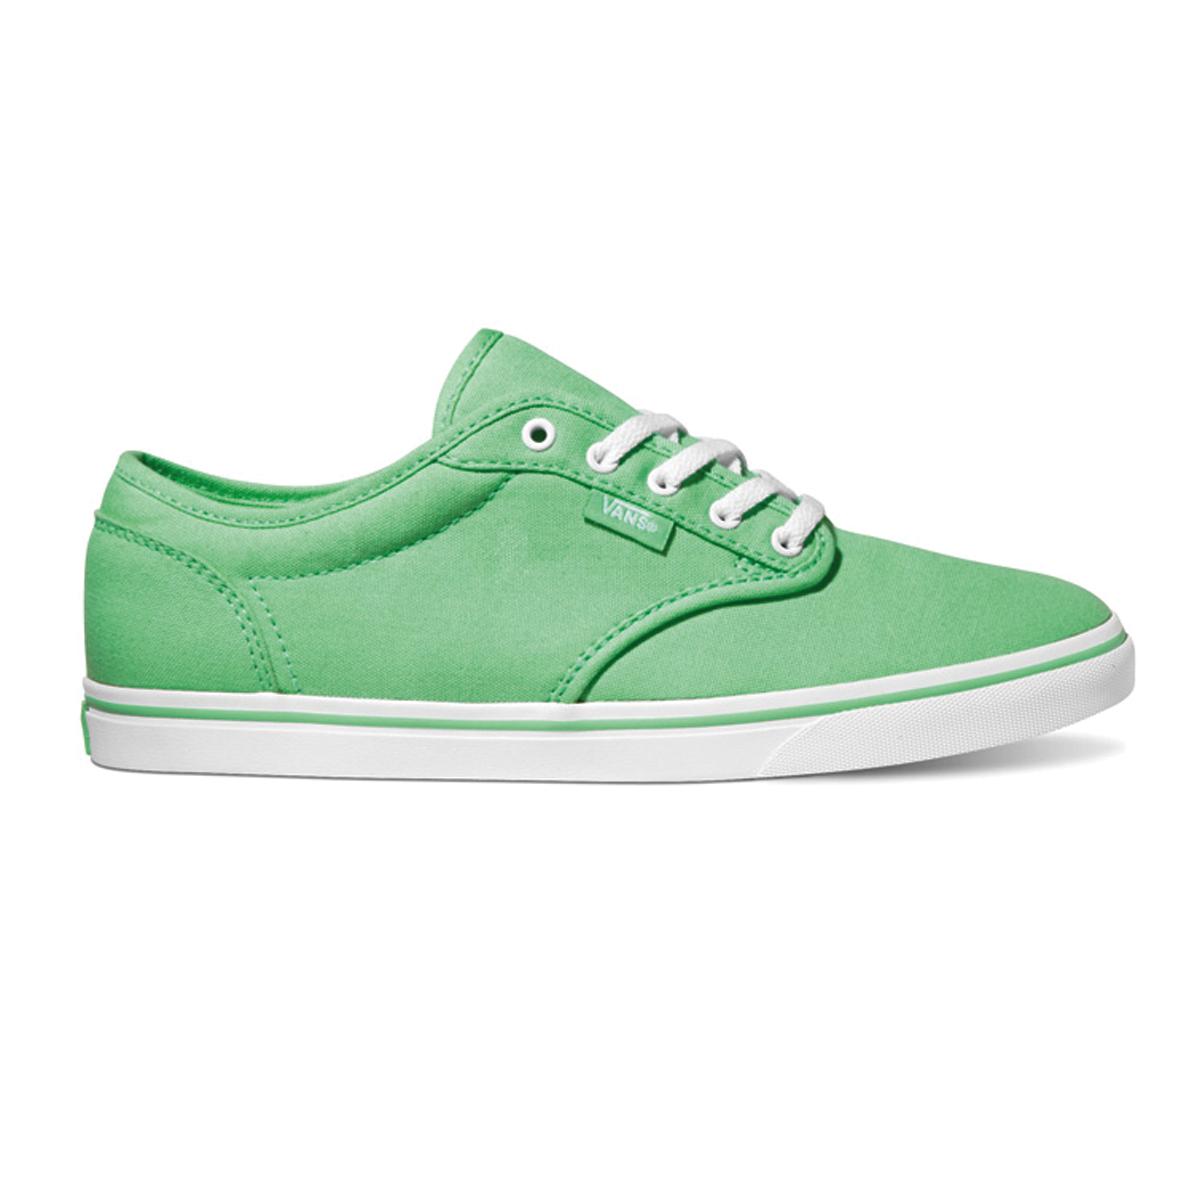 Off 65 2014 gt; Compre Vans Zapatillas Mujer xqYSnawg